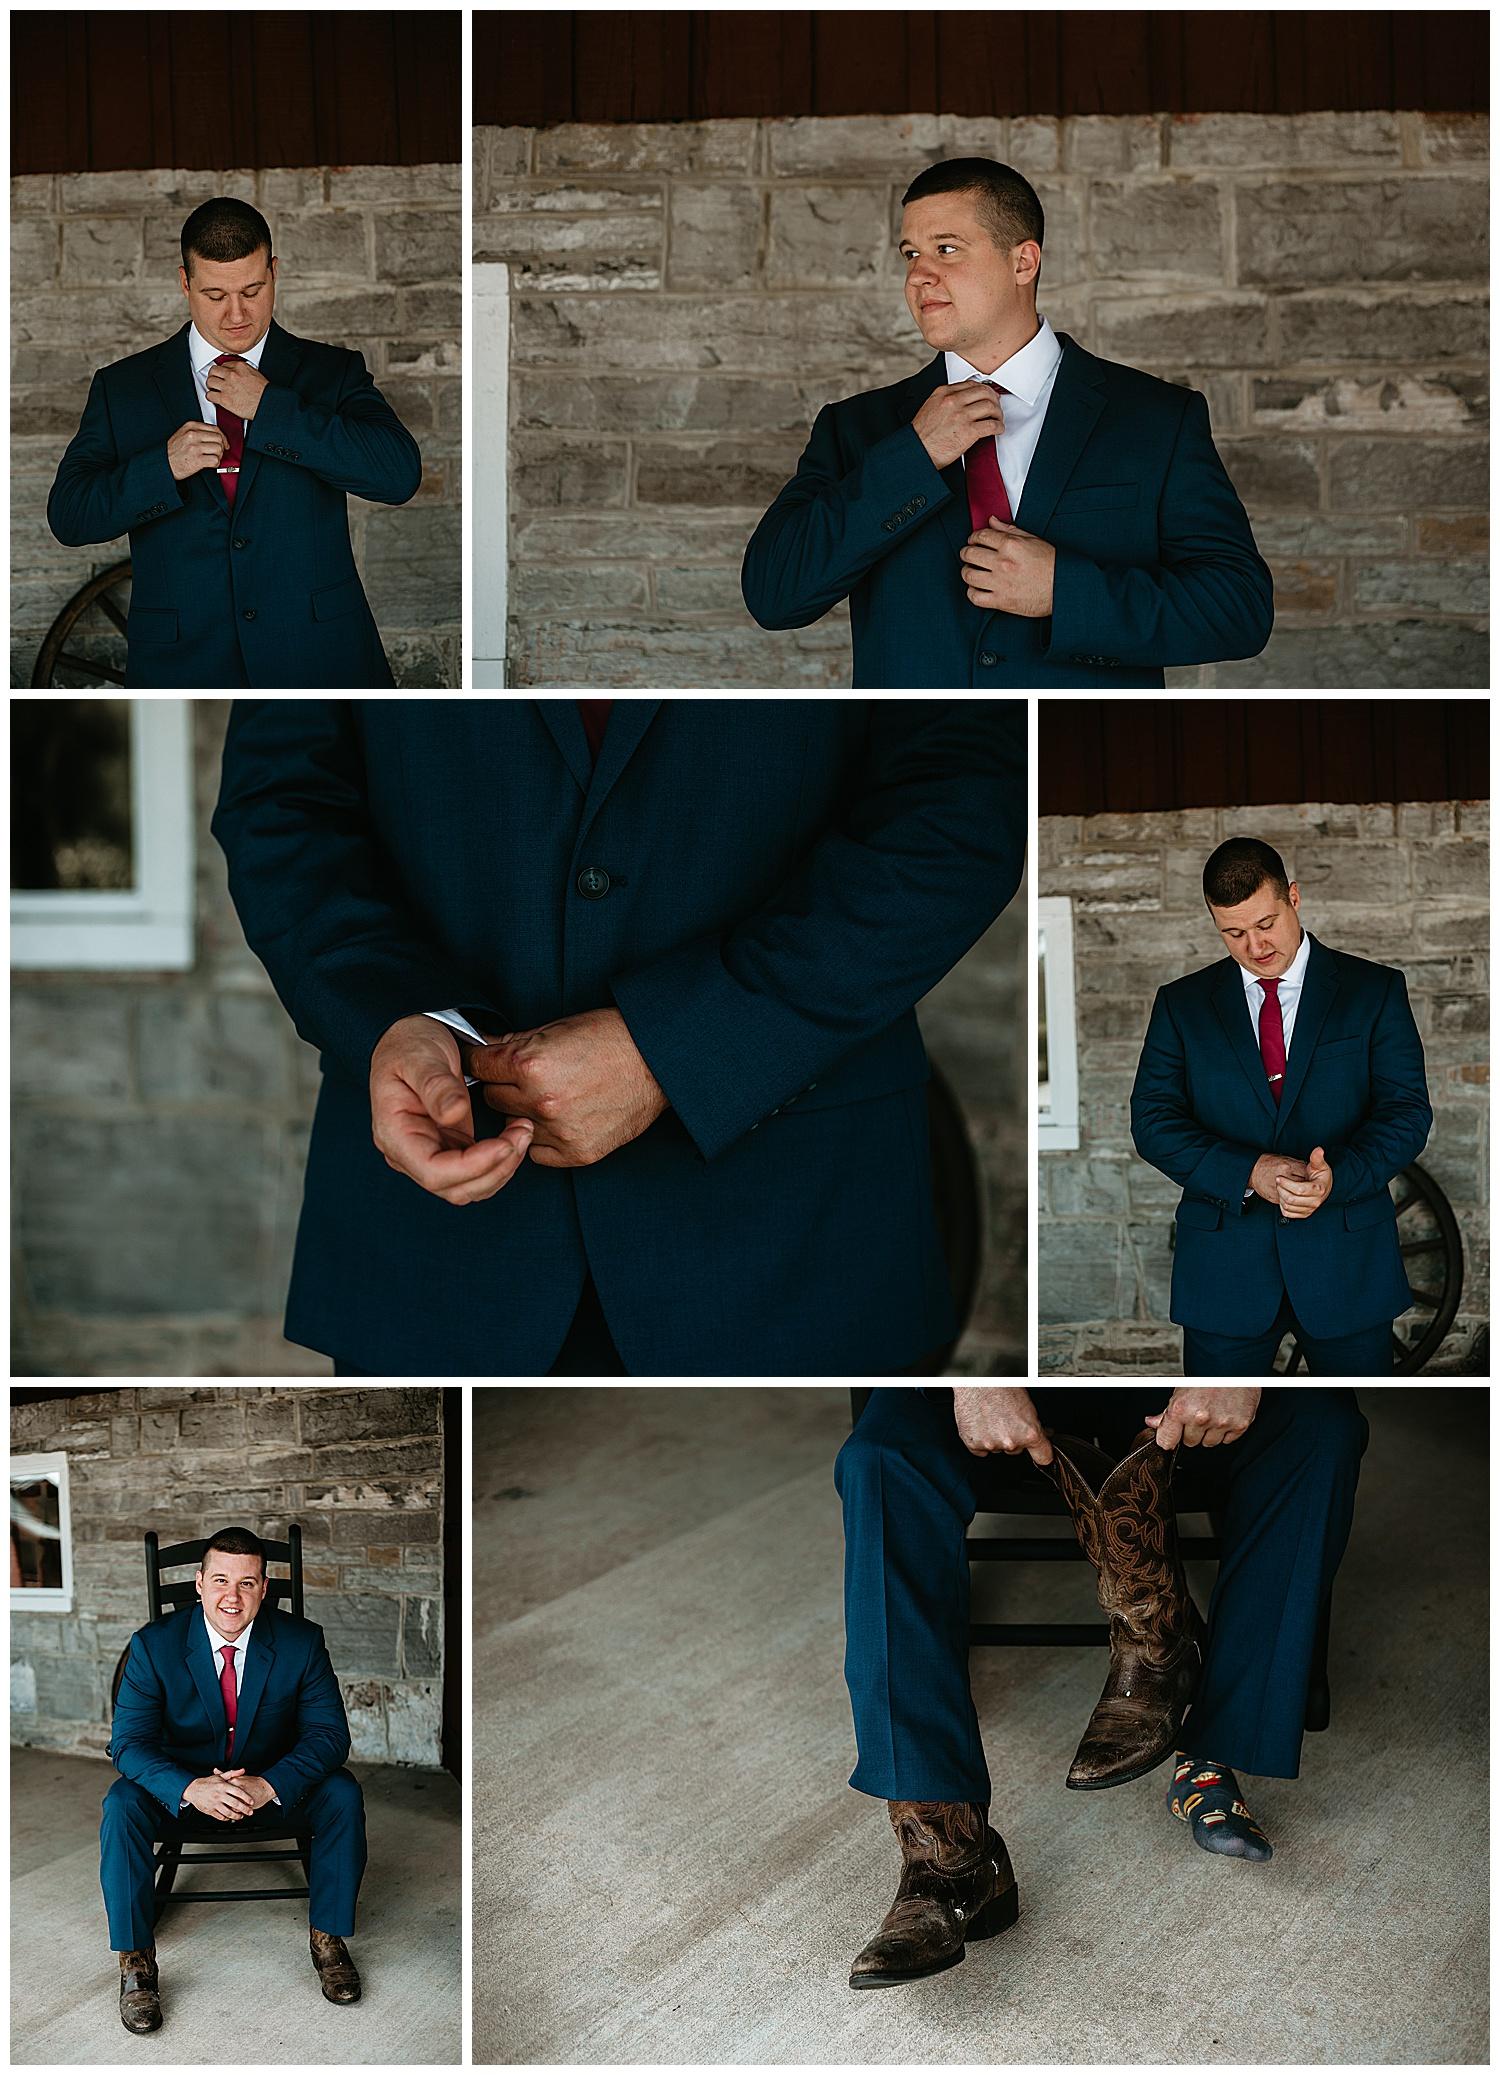 NEPA-Bloomgsburg-Wedding-Photographer-at-The-Barn-at-Greystone-Farms-Watsontown-PA_0008.jpg